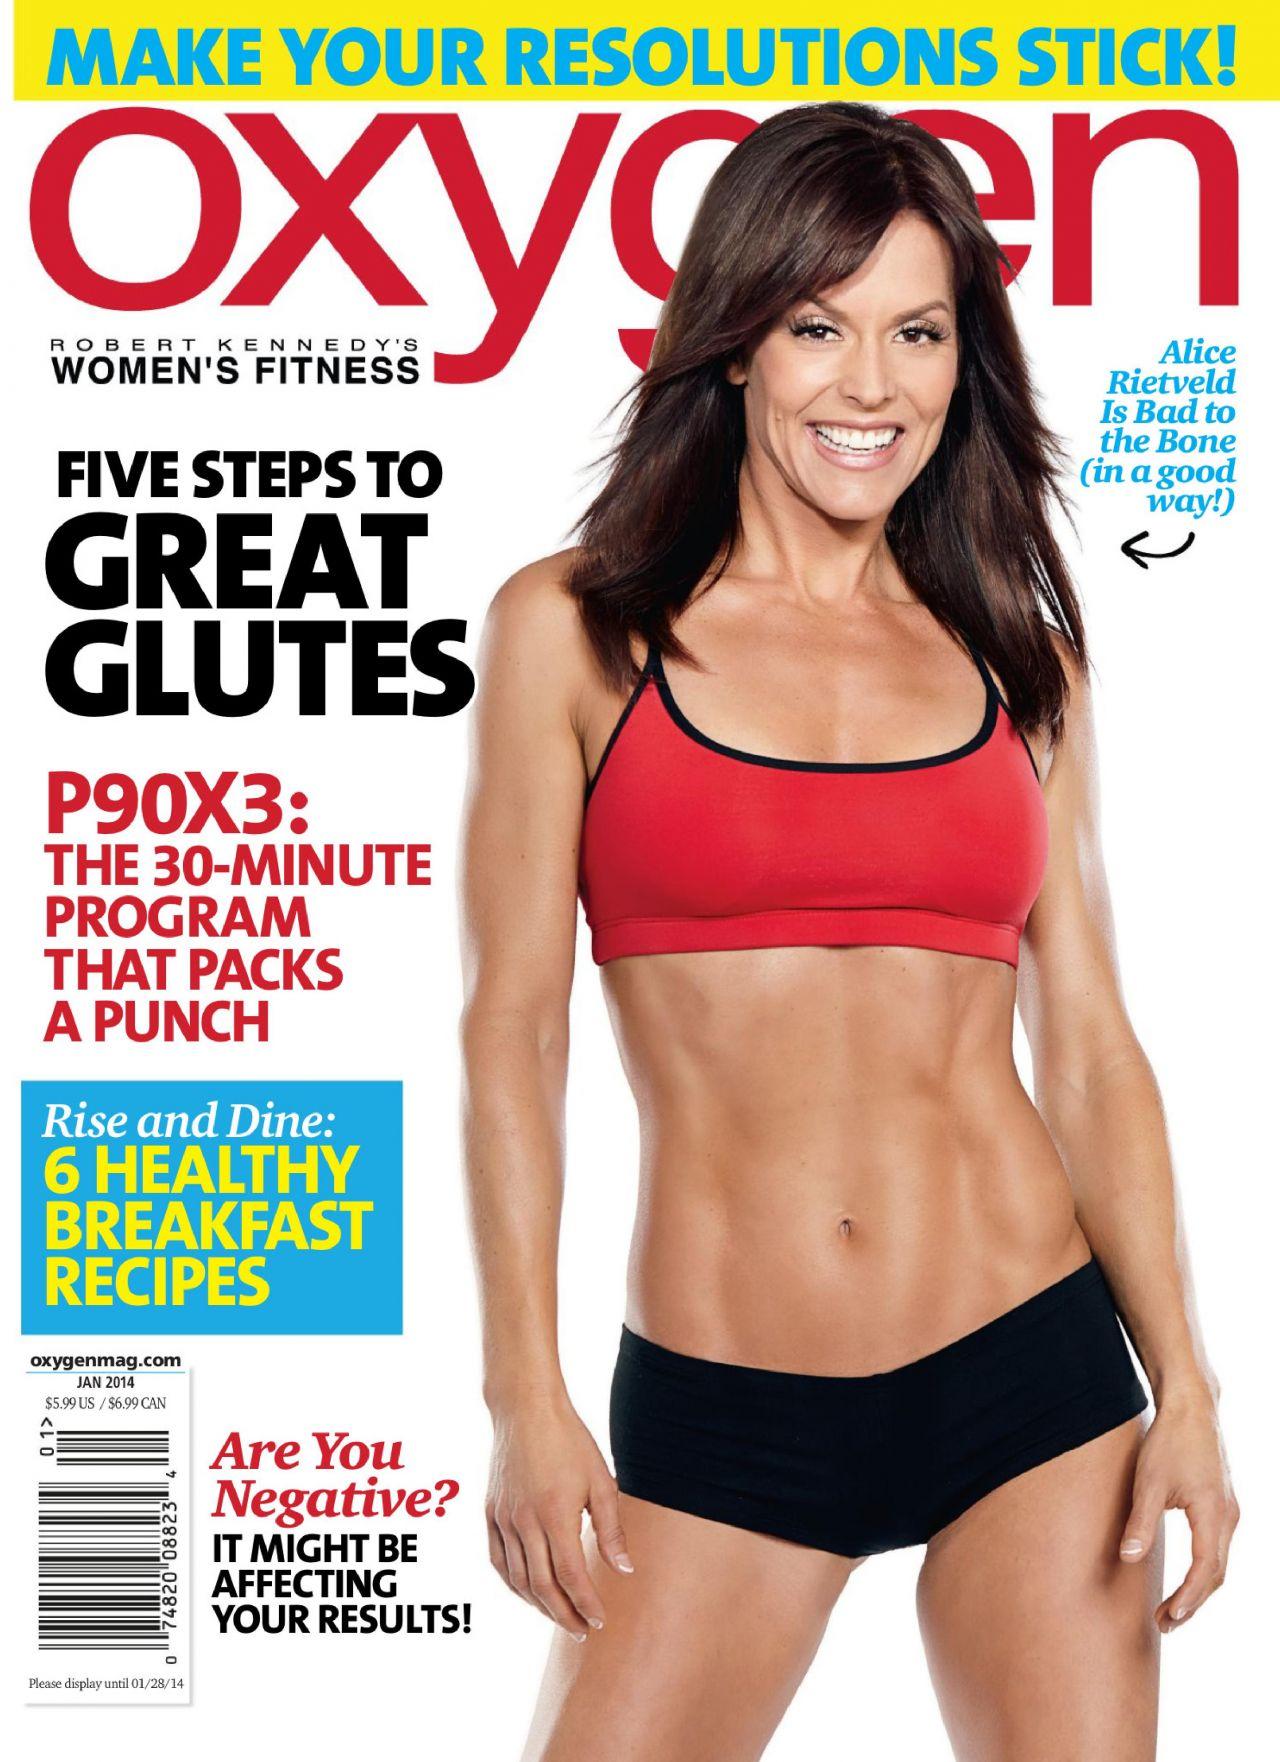 Alice Rietveld - OXYGEN Magazine (USA) - January 2014 Issue